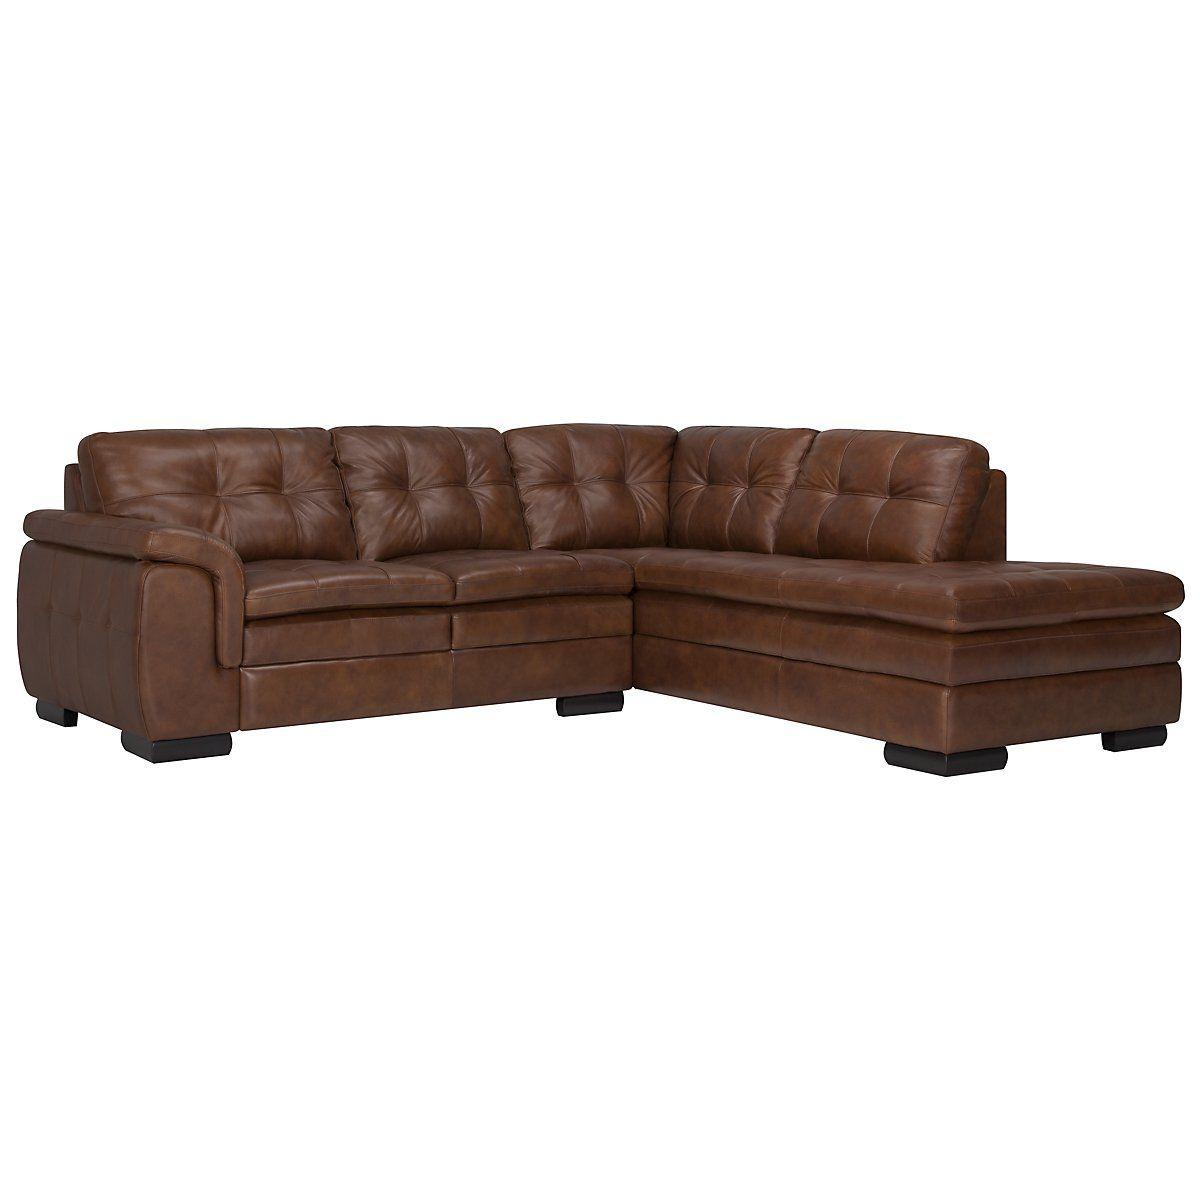 Trevor md brown leather small right bumper sectional trevor md brown leather small right bumper sectional sectional sofa